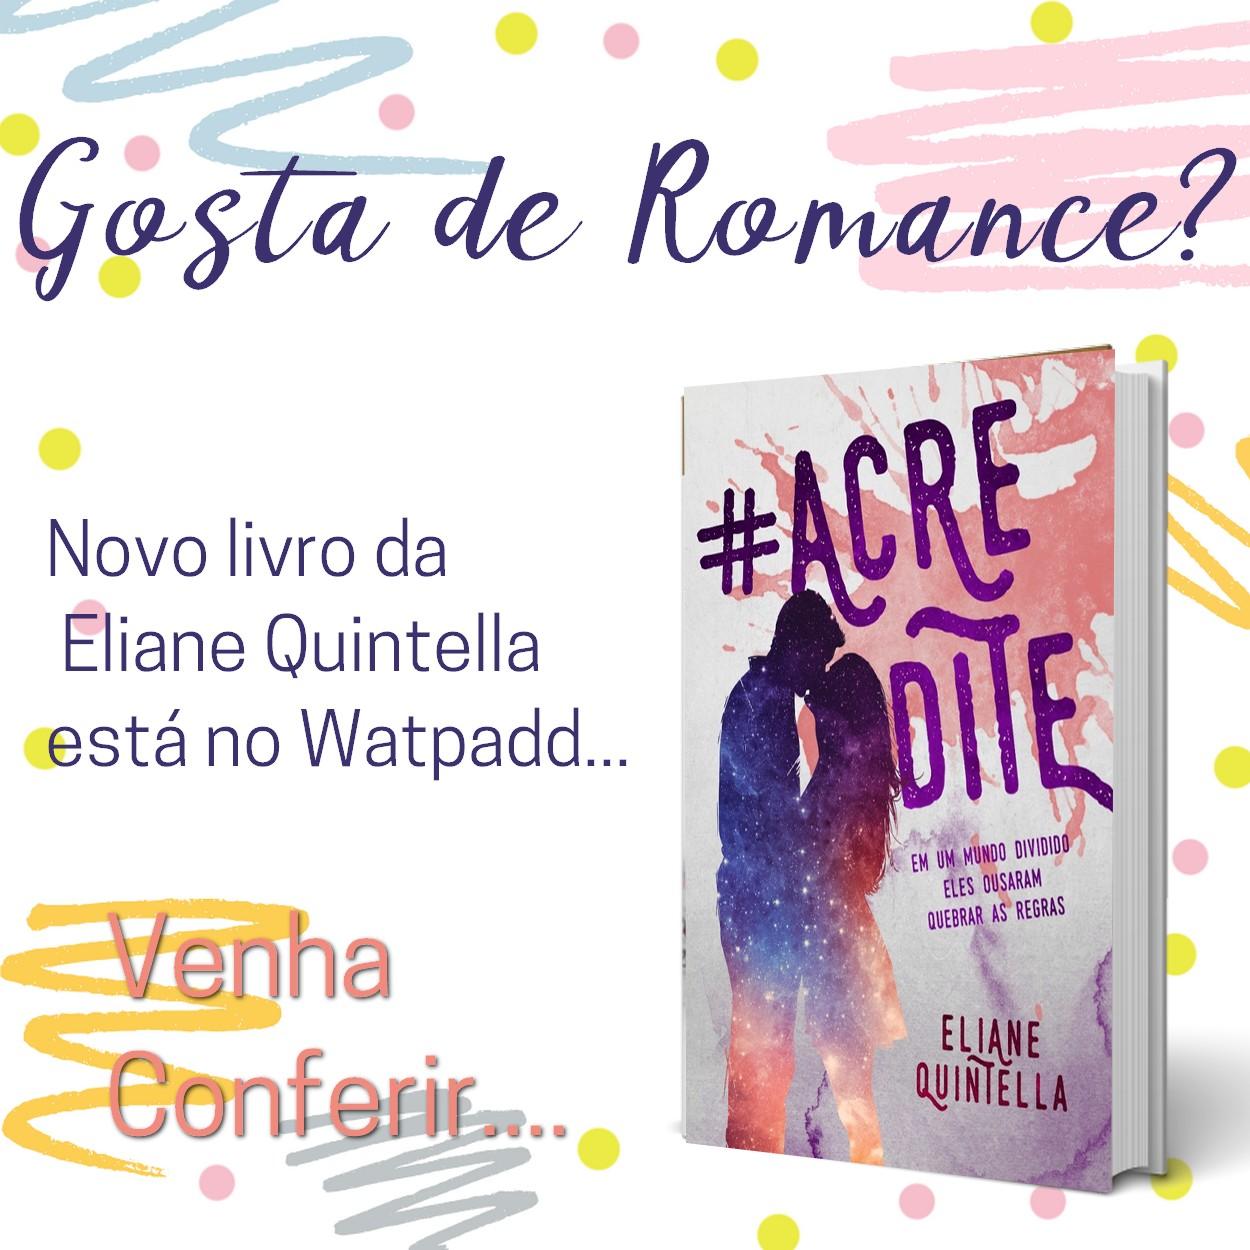 Livro - Acredite da Eliane Quintella